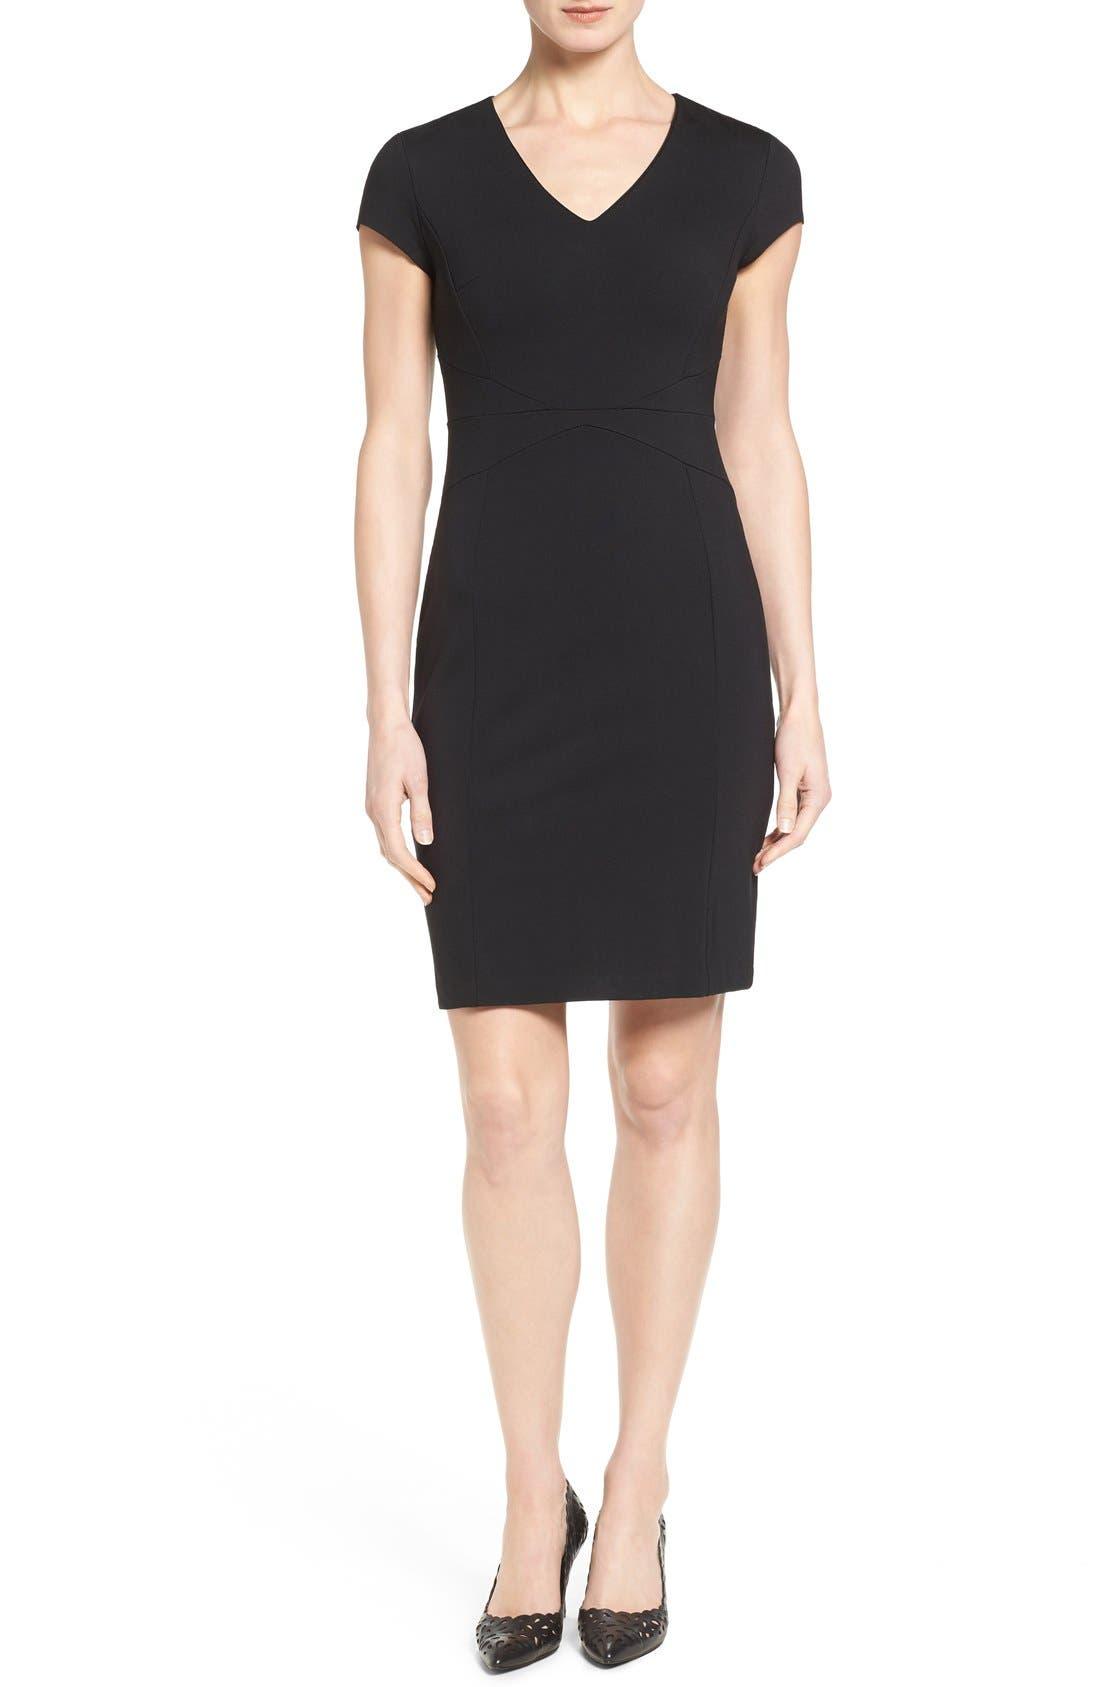 HALOGEN<SUP>®</SUP>, Seamed V-Neck Ponte Sheath Dress, Main thumbnail 1, color, 001